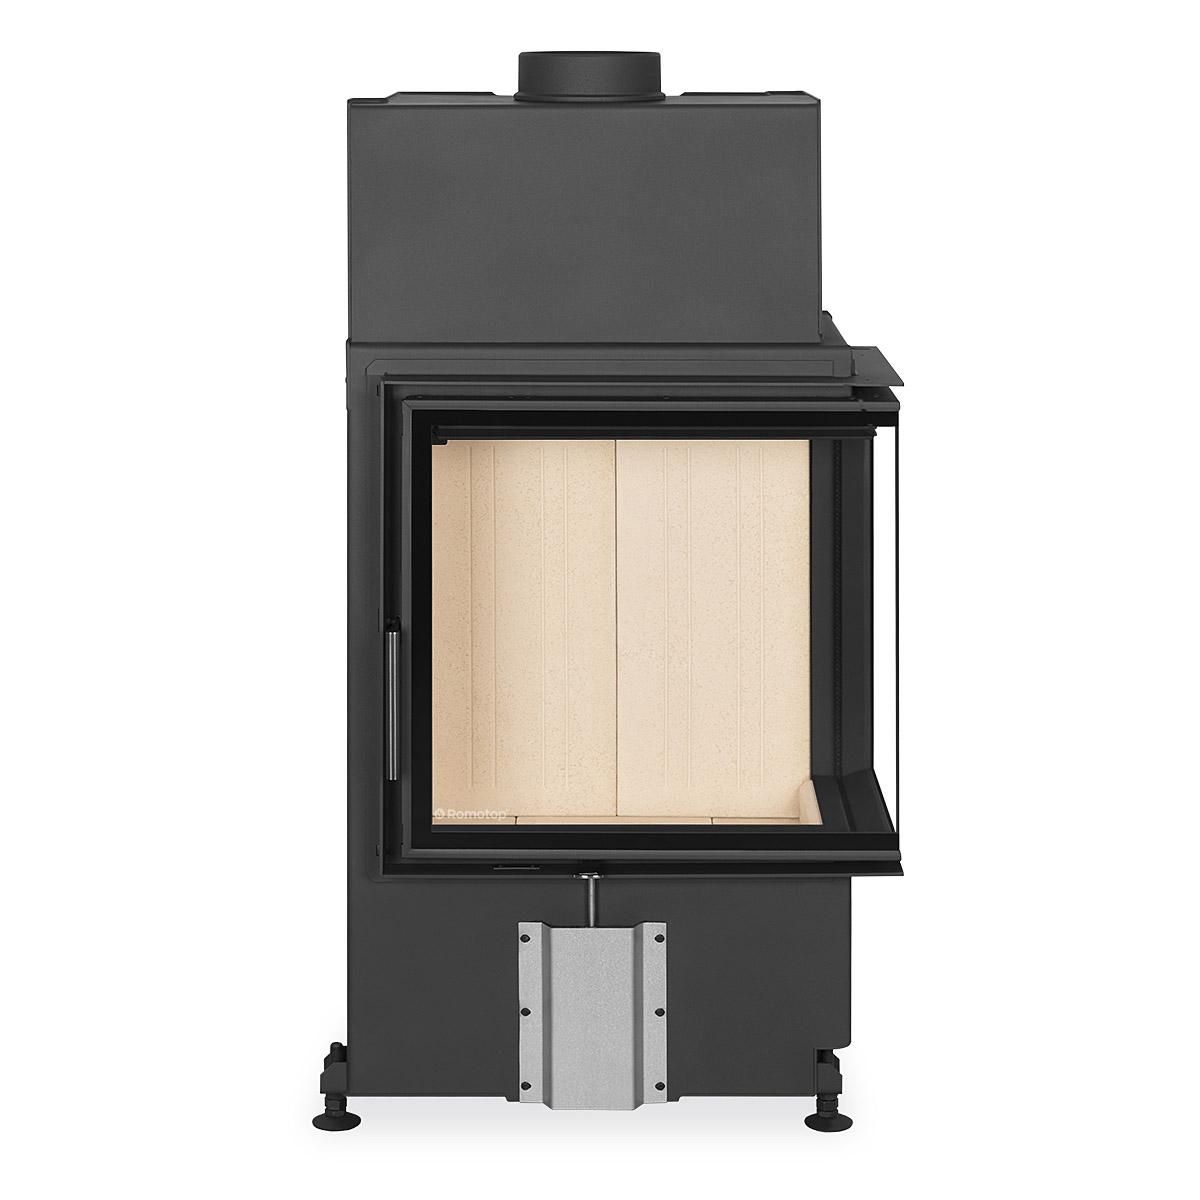 Romotop Fireplace Inserts Impression